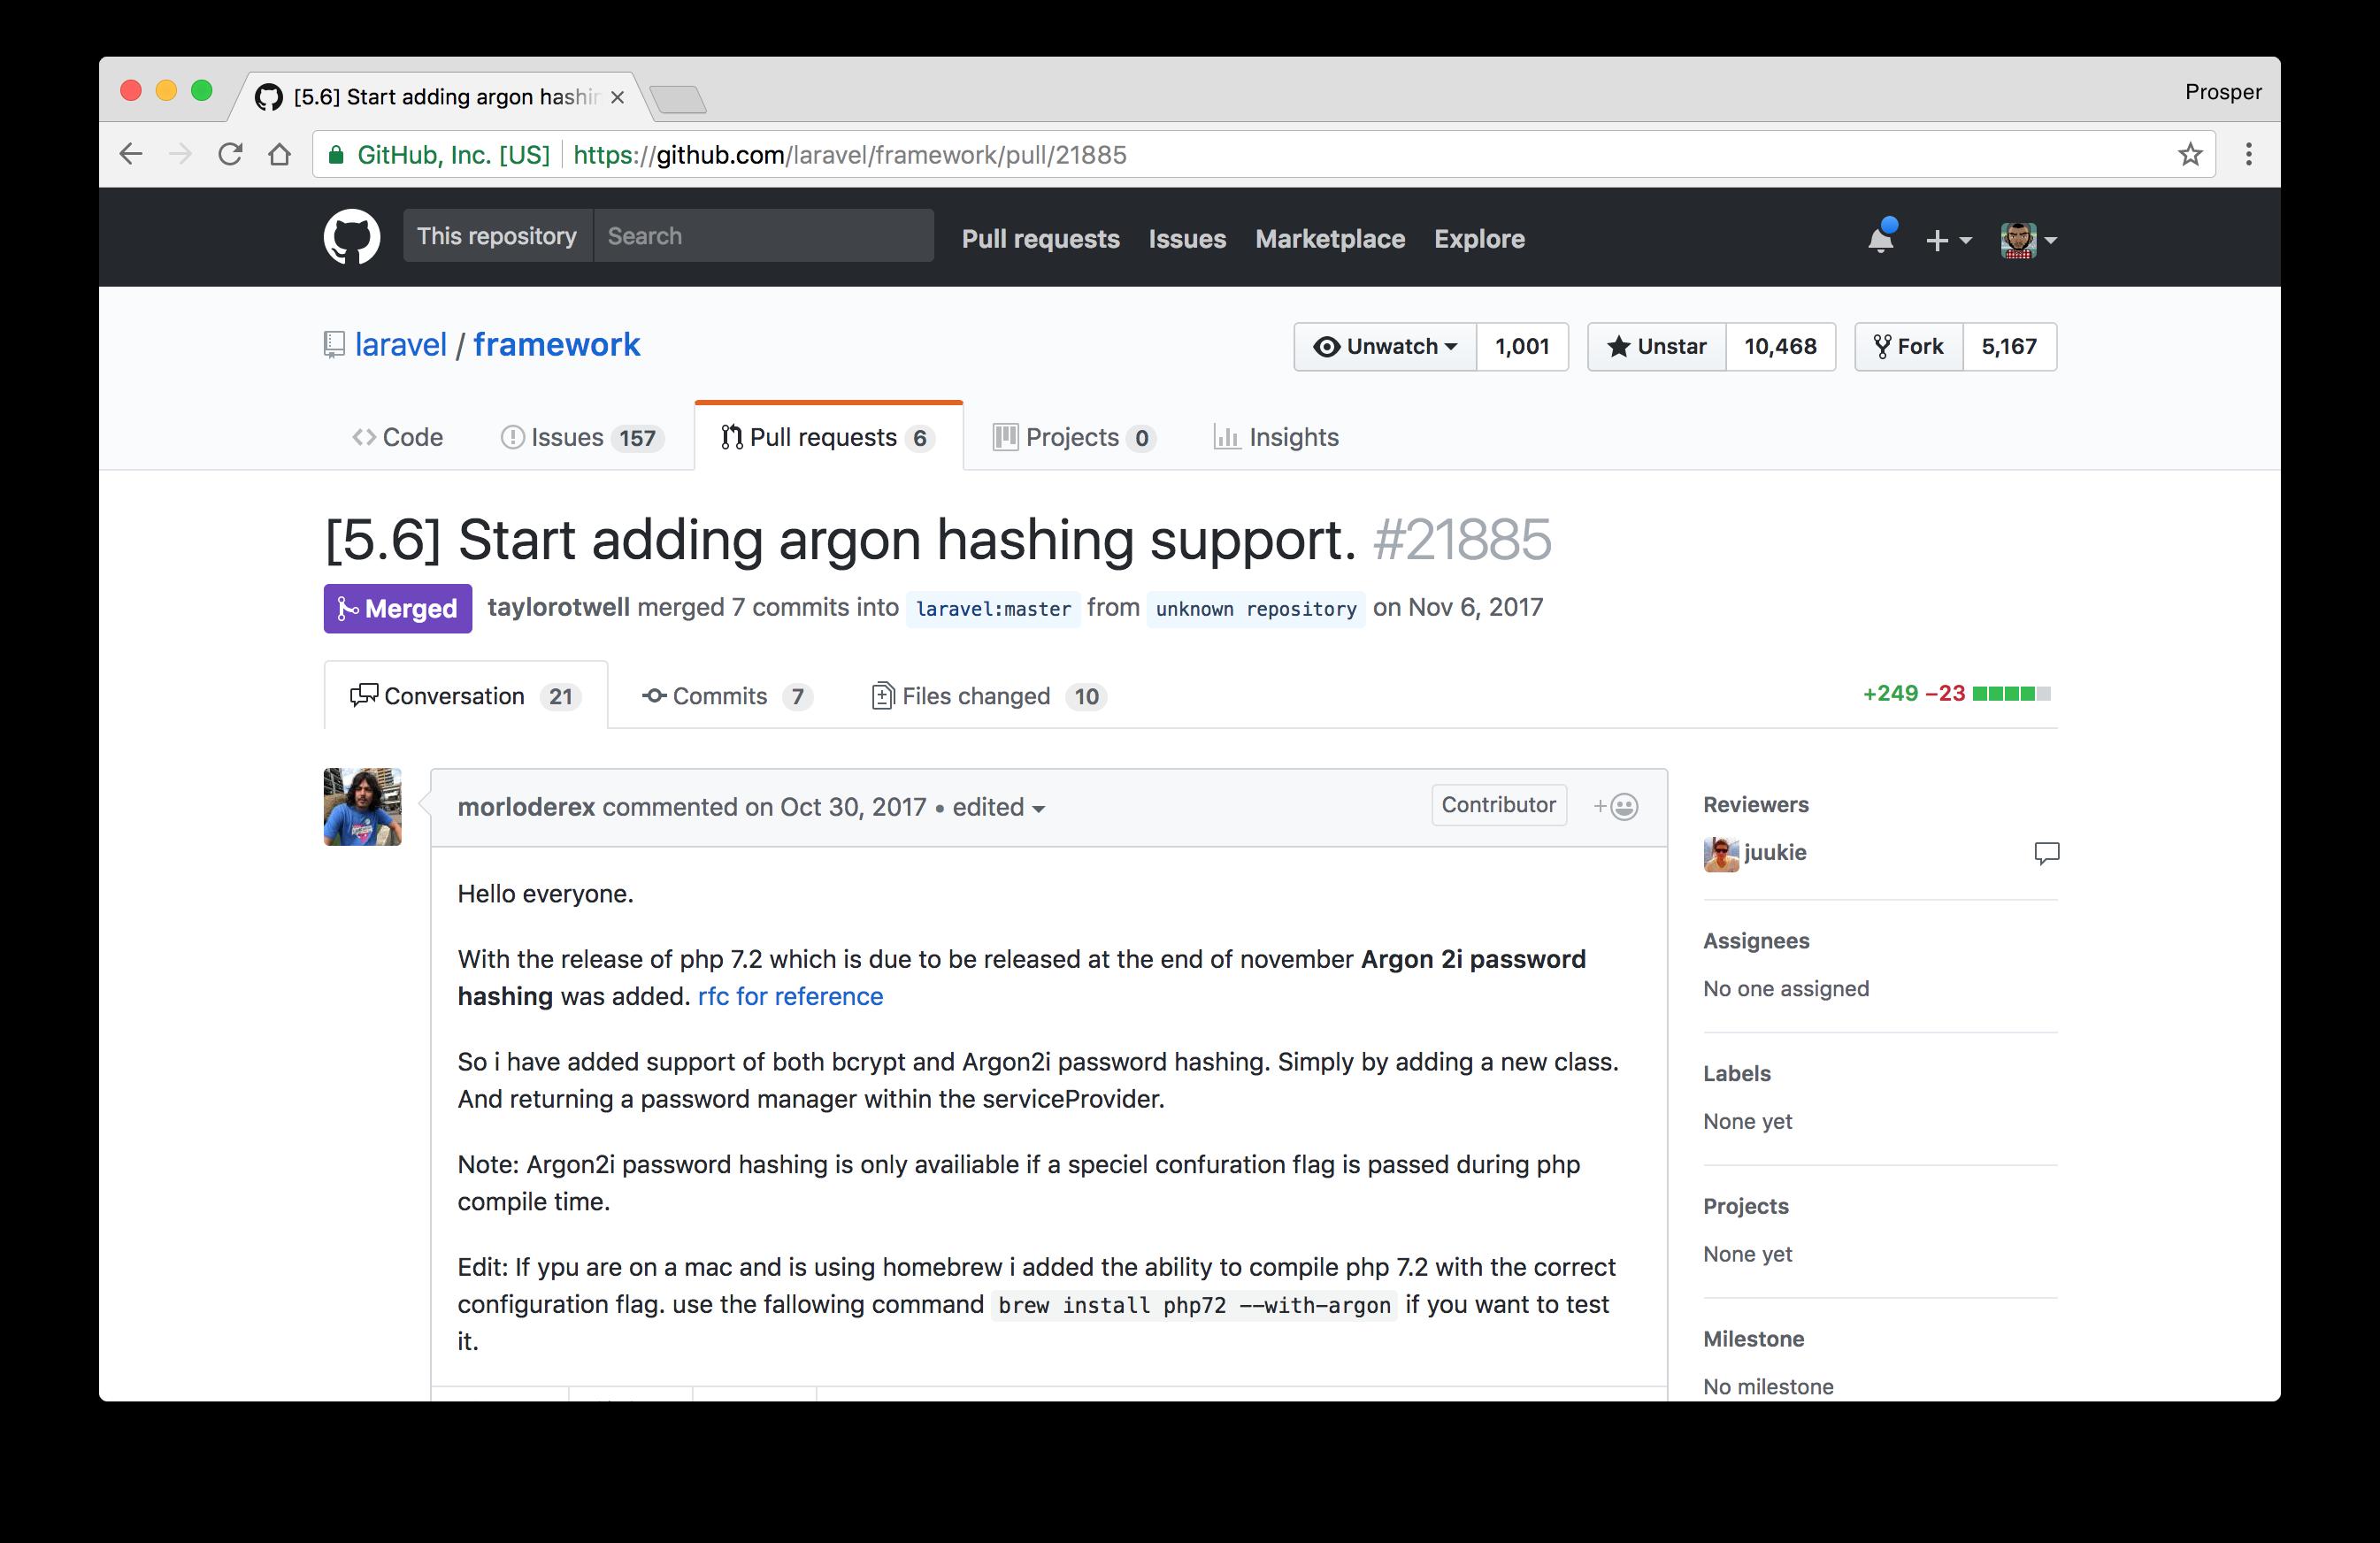 Argon Password Hashing Support